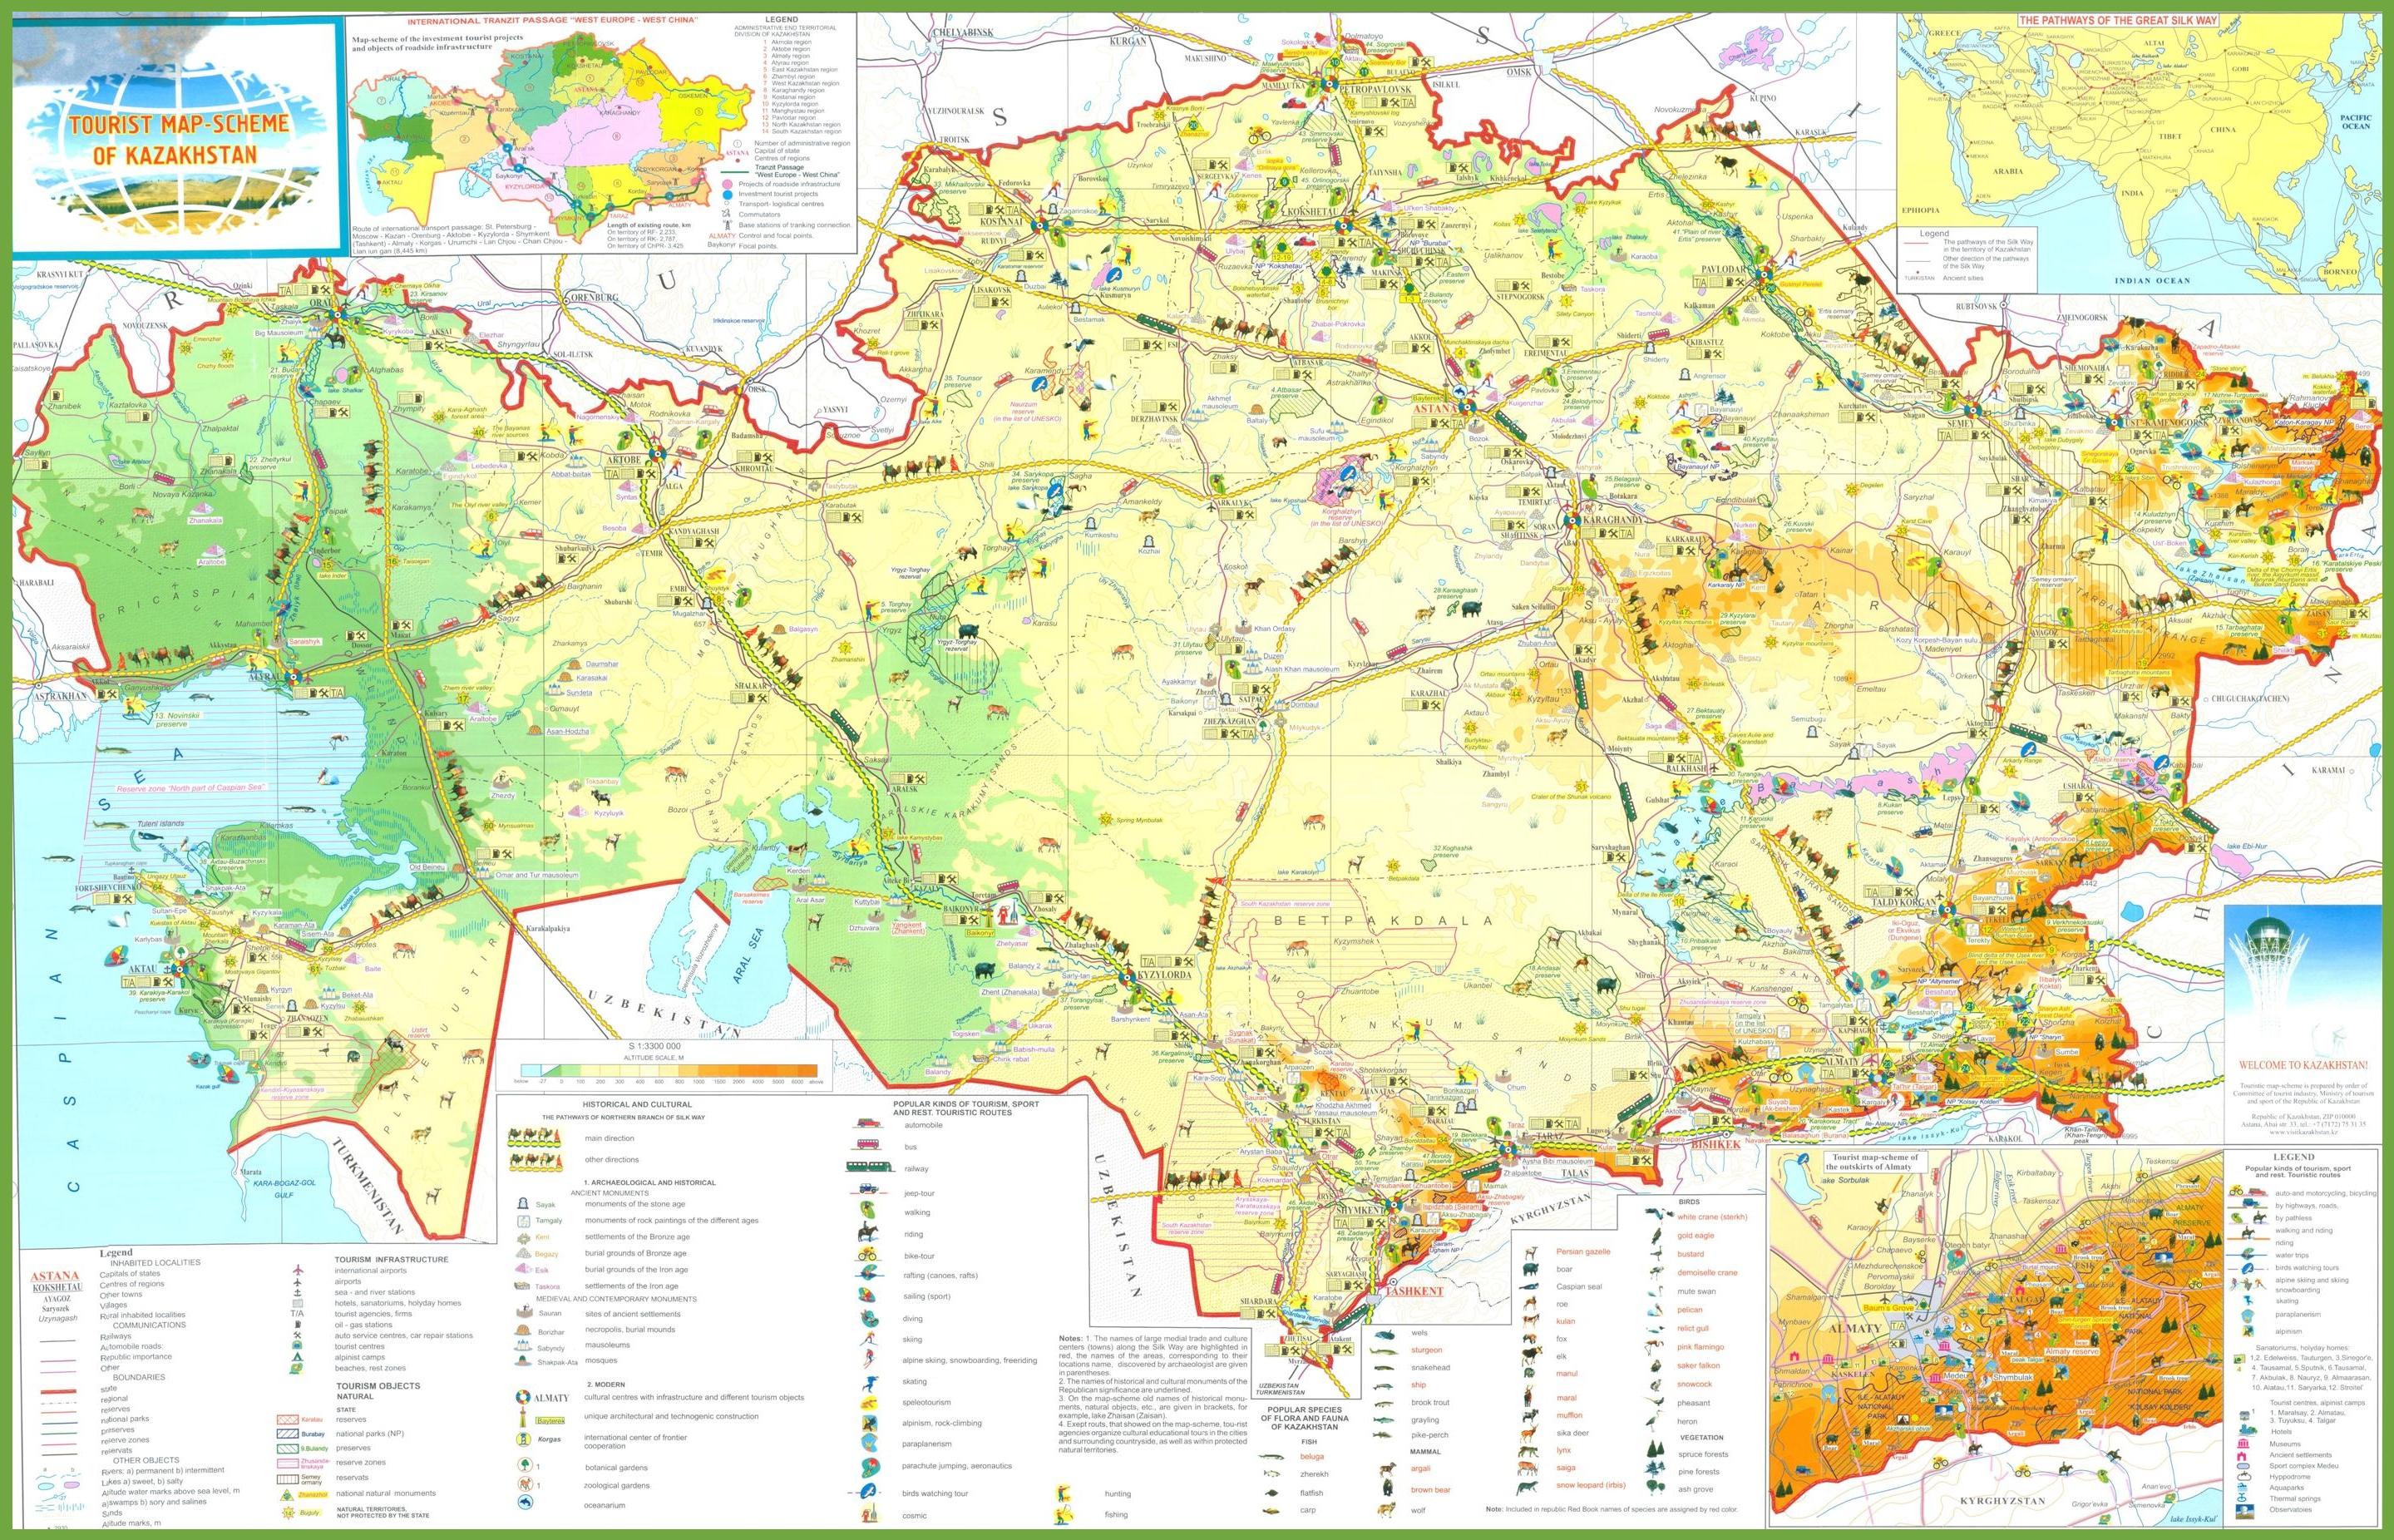 Kazakhstan Maps Maps Of Kazakhstan - Kazakhstan map